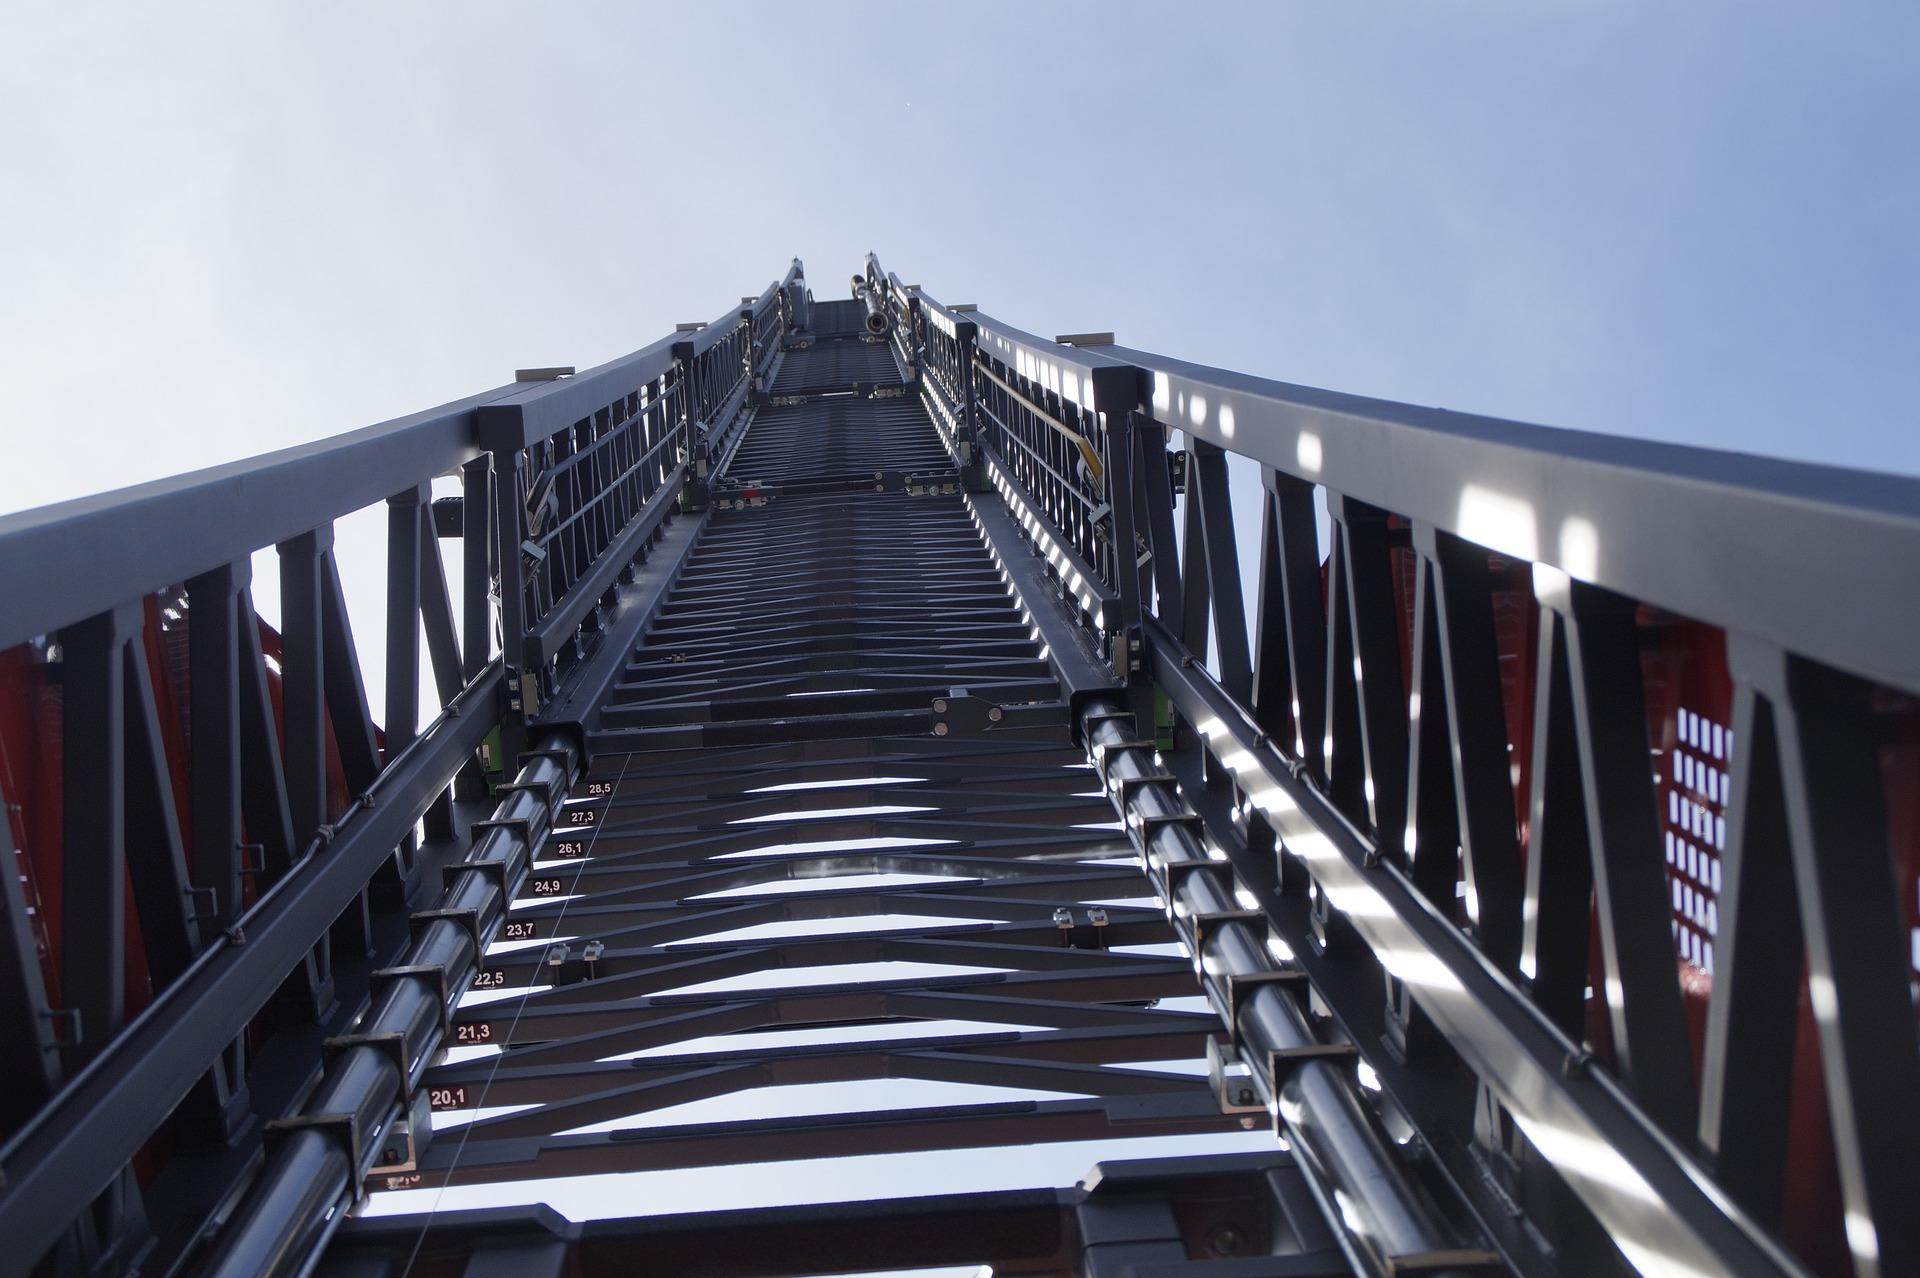 turntable-ladder-1645264_1920